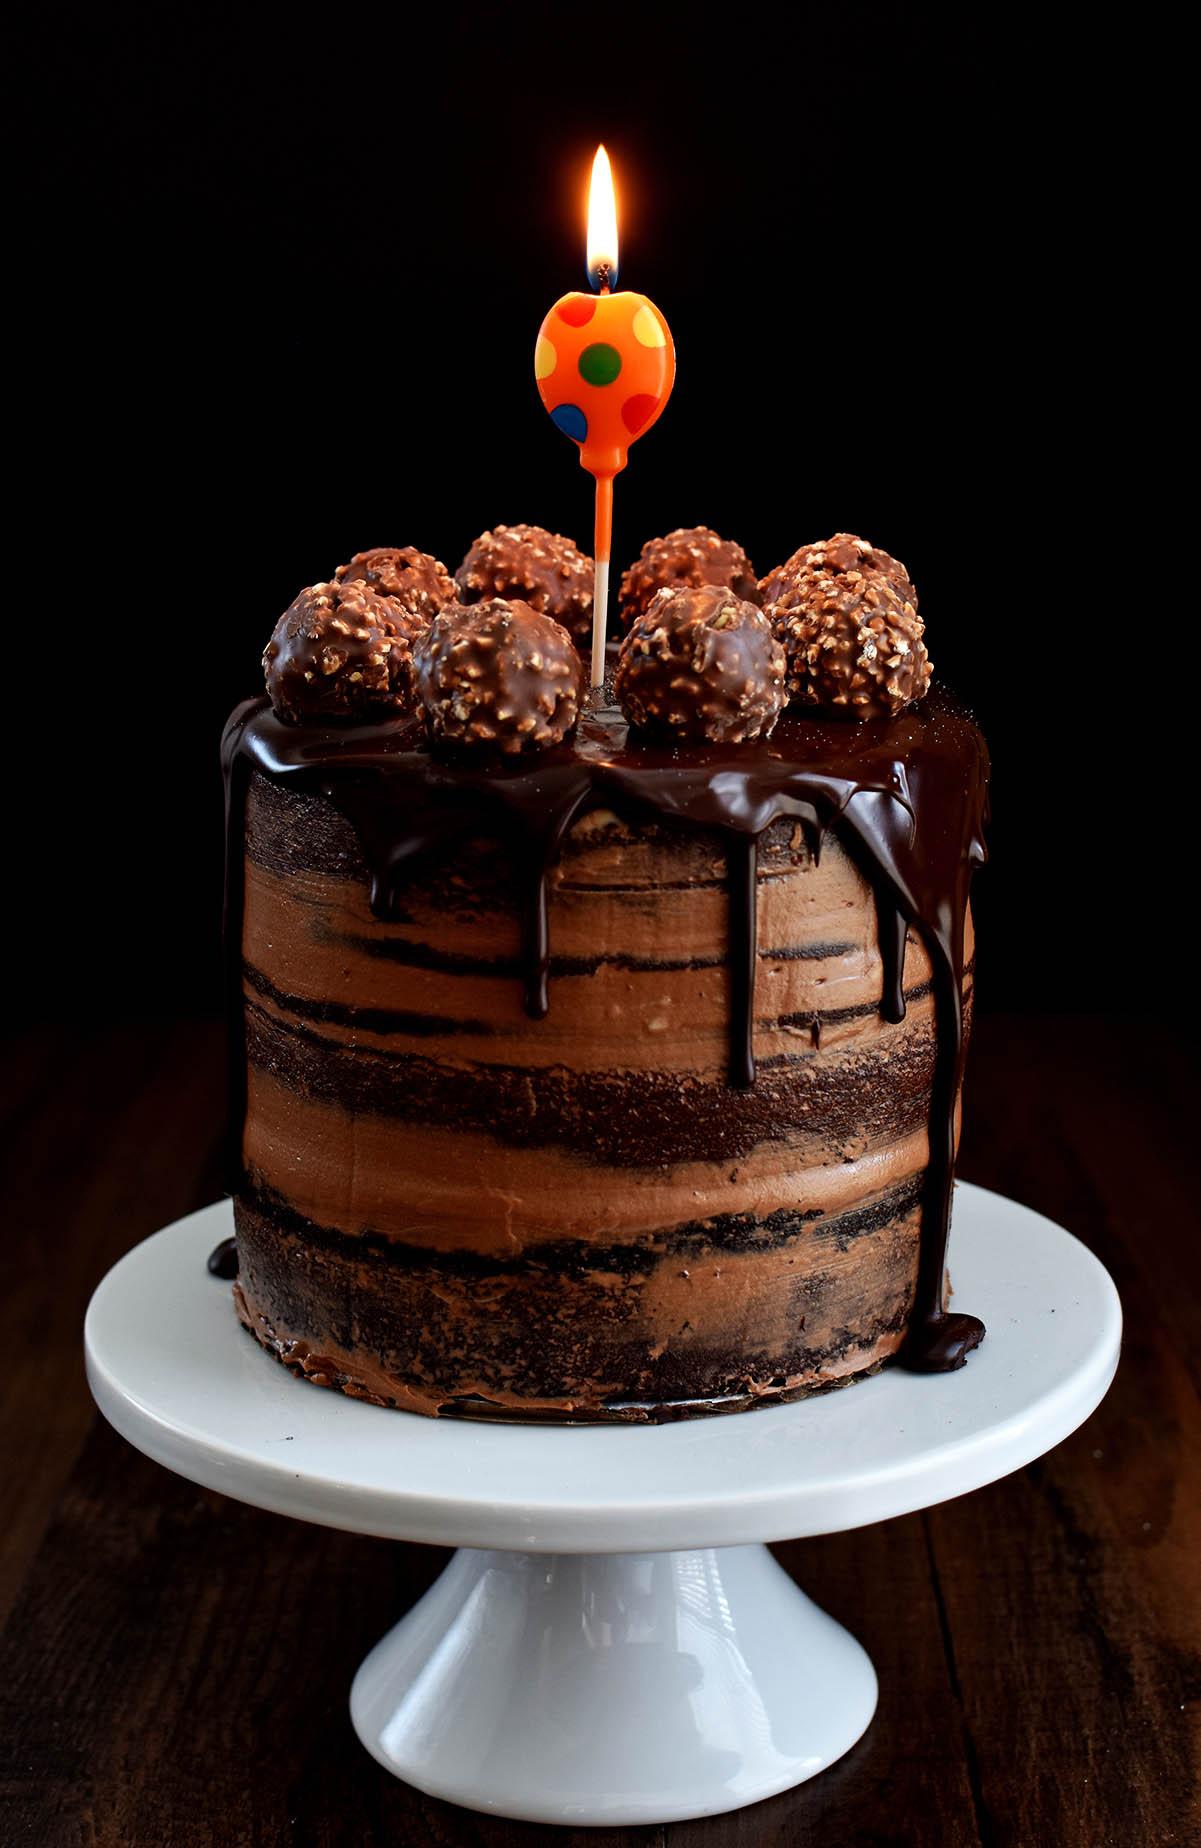 Chocolate Hazelnut Semi Naked Cake With Dark Chocolate